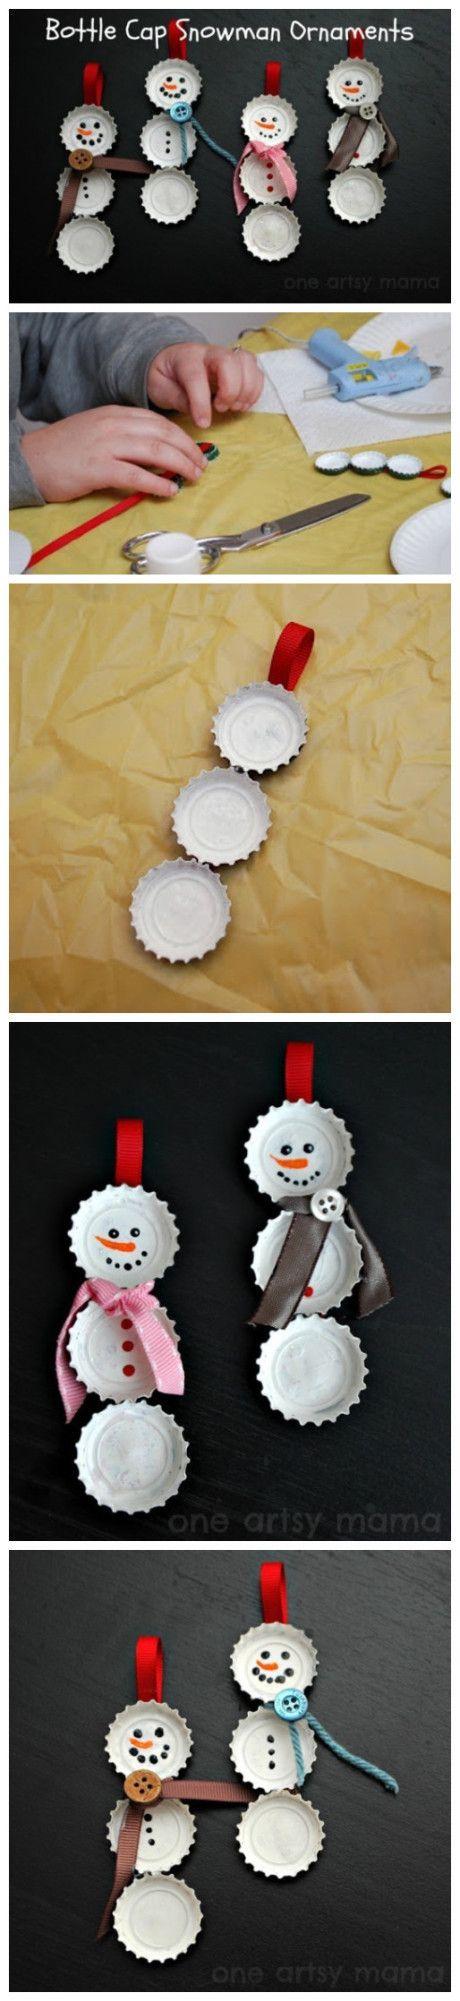 Handmade snowman discarded bottle cap